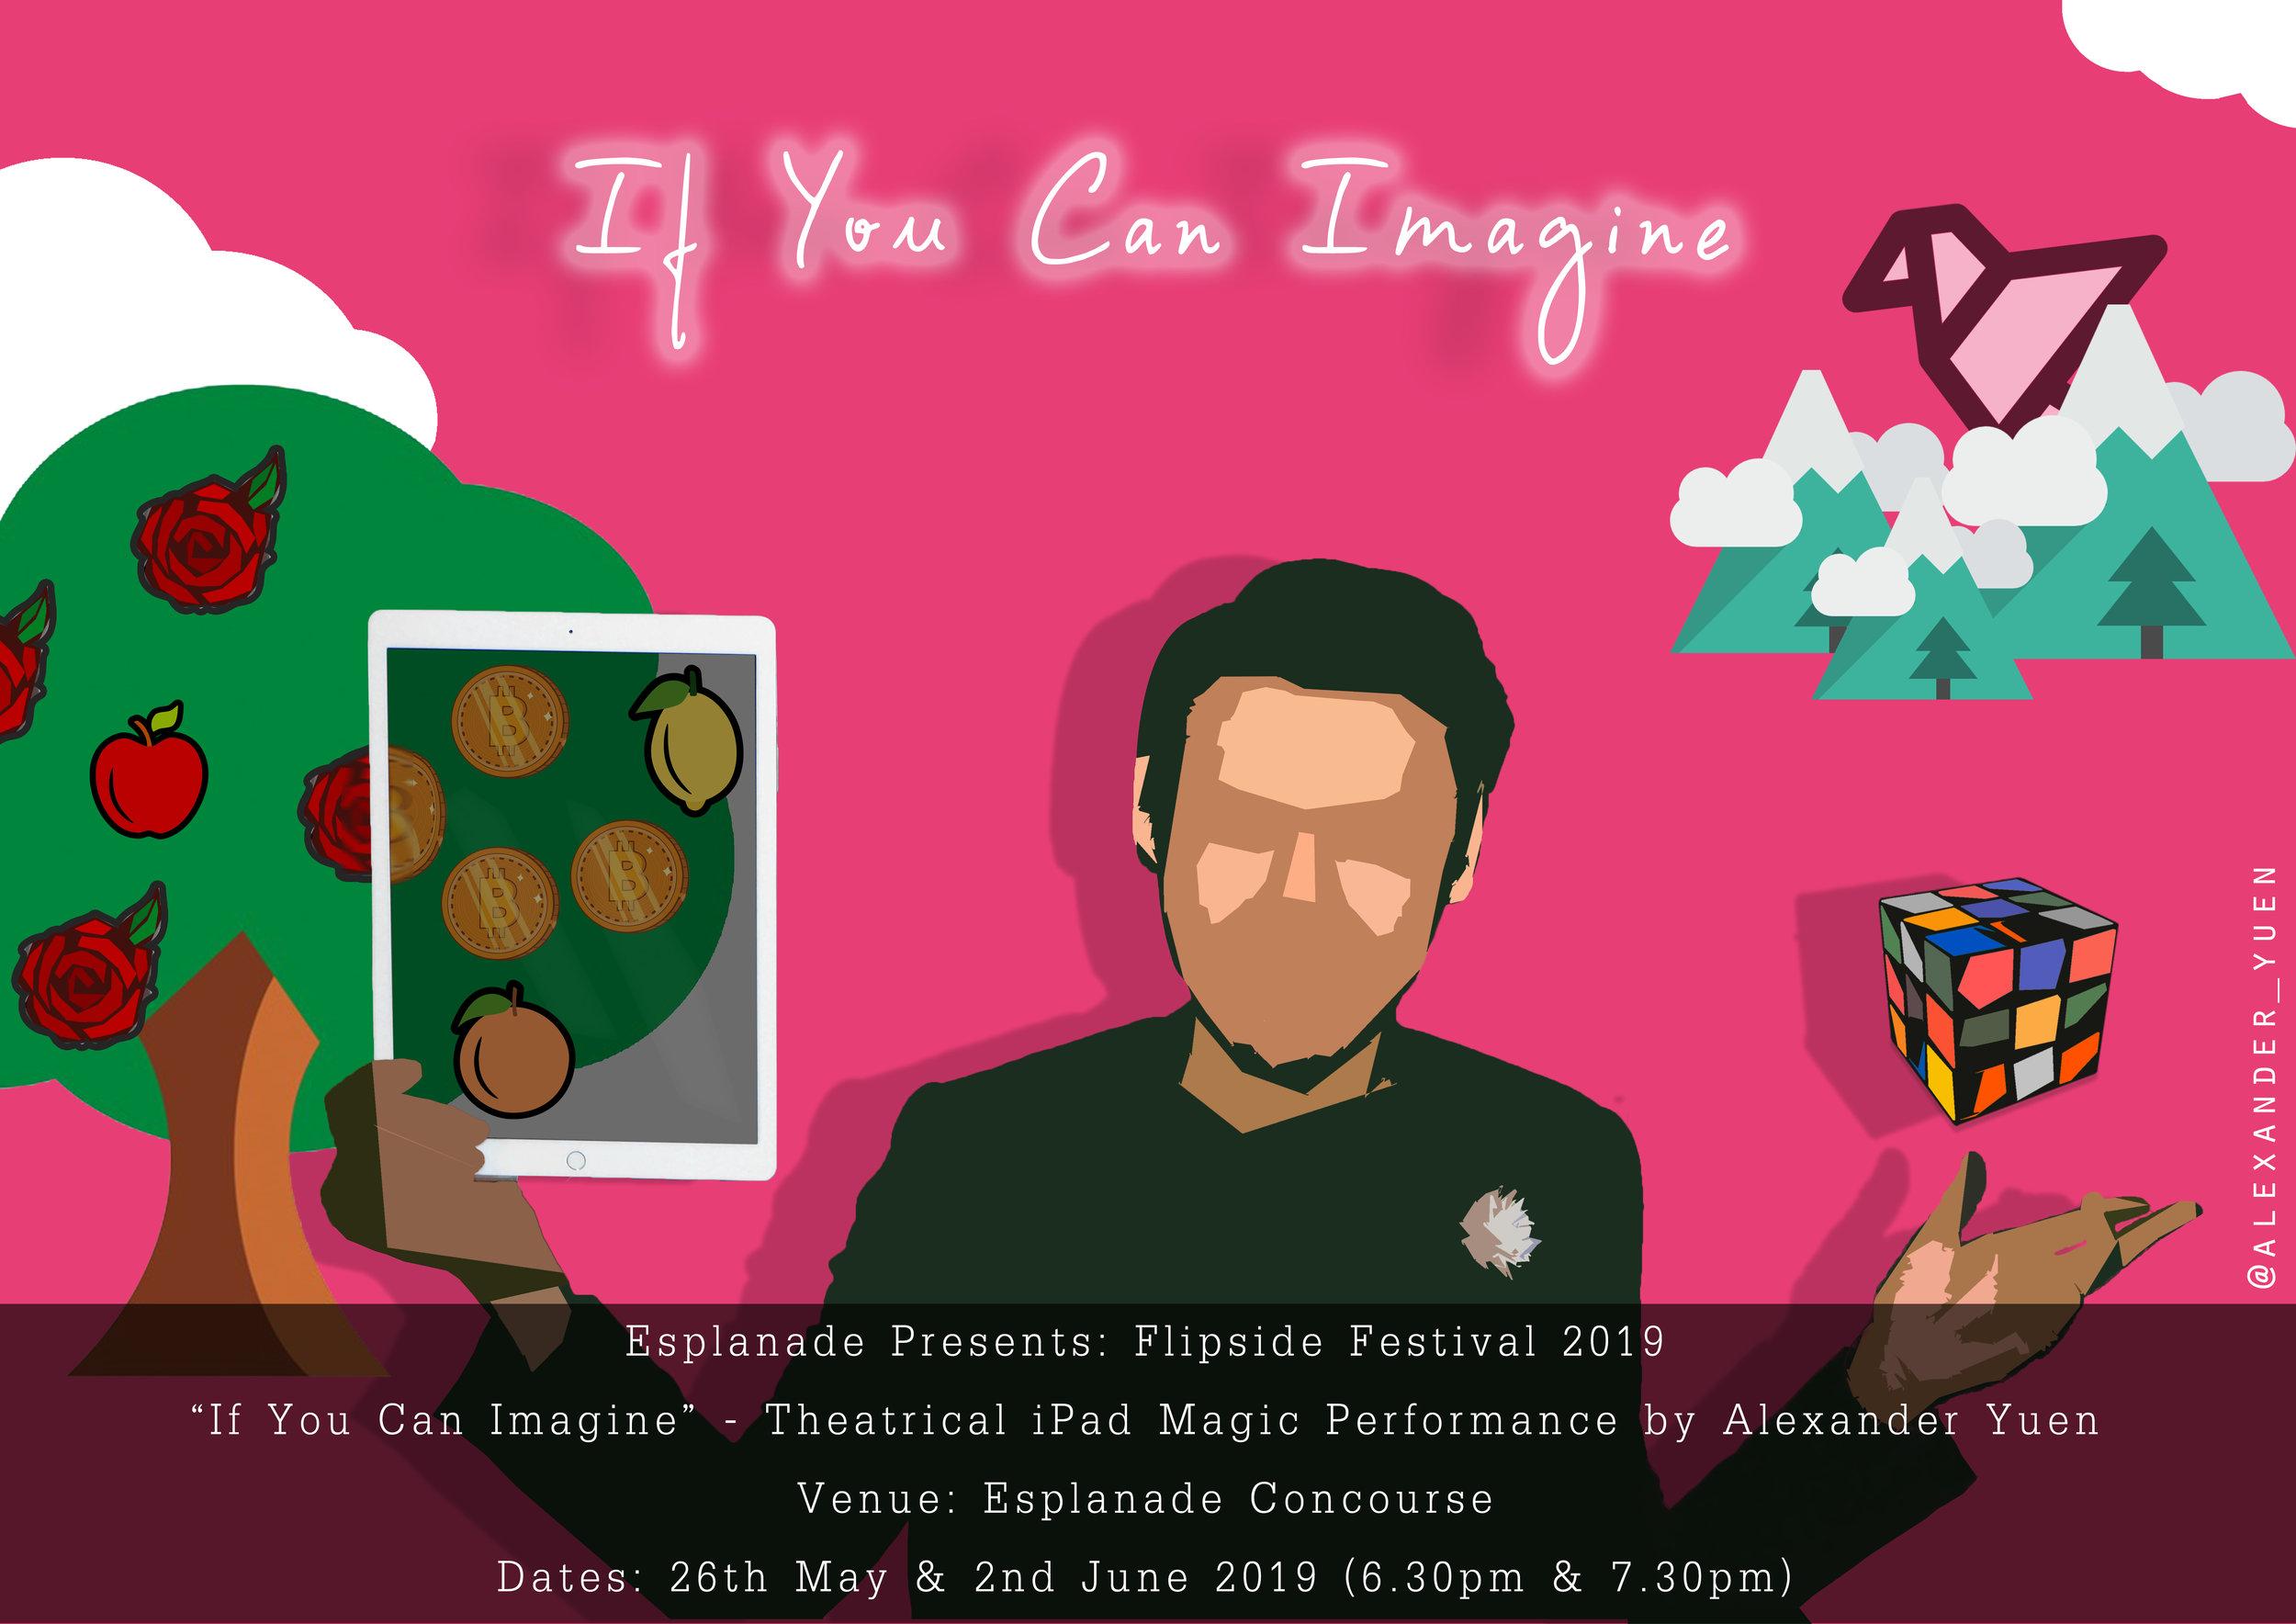 If You Can Imagine by Alexander Yuen iPad Magic